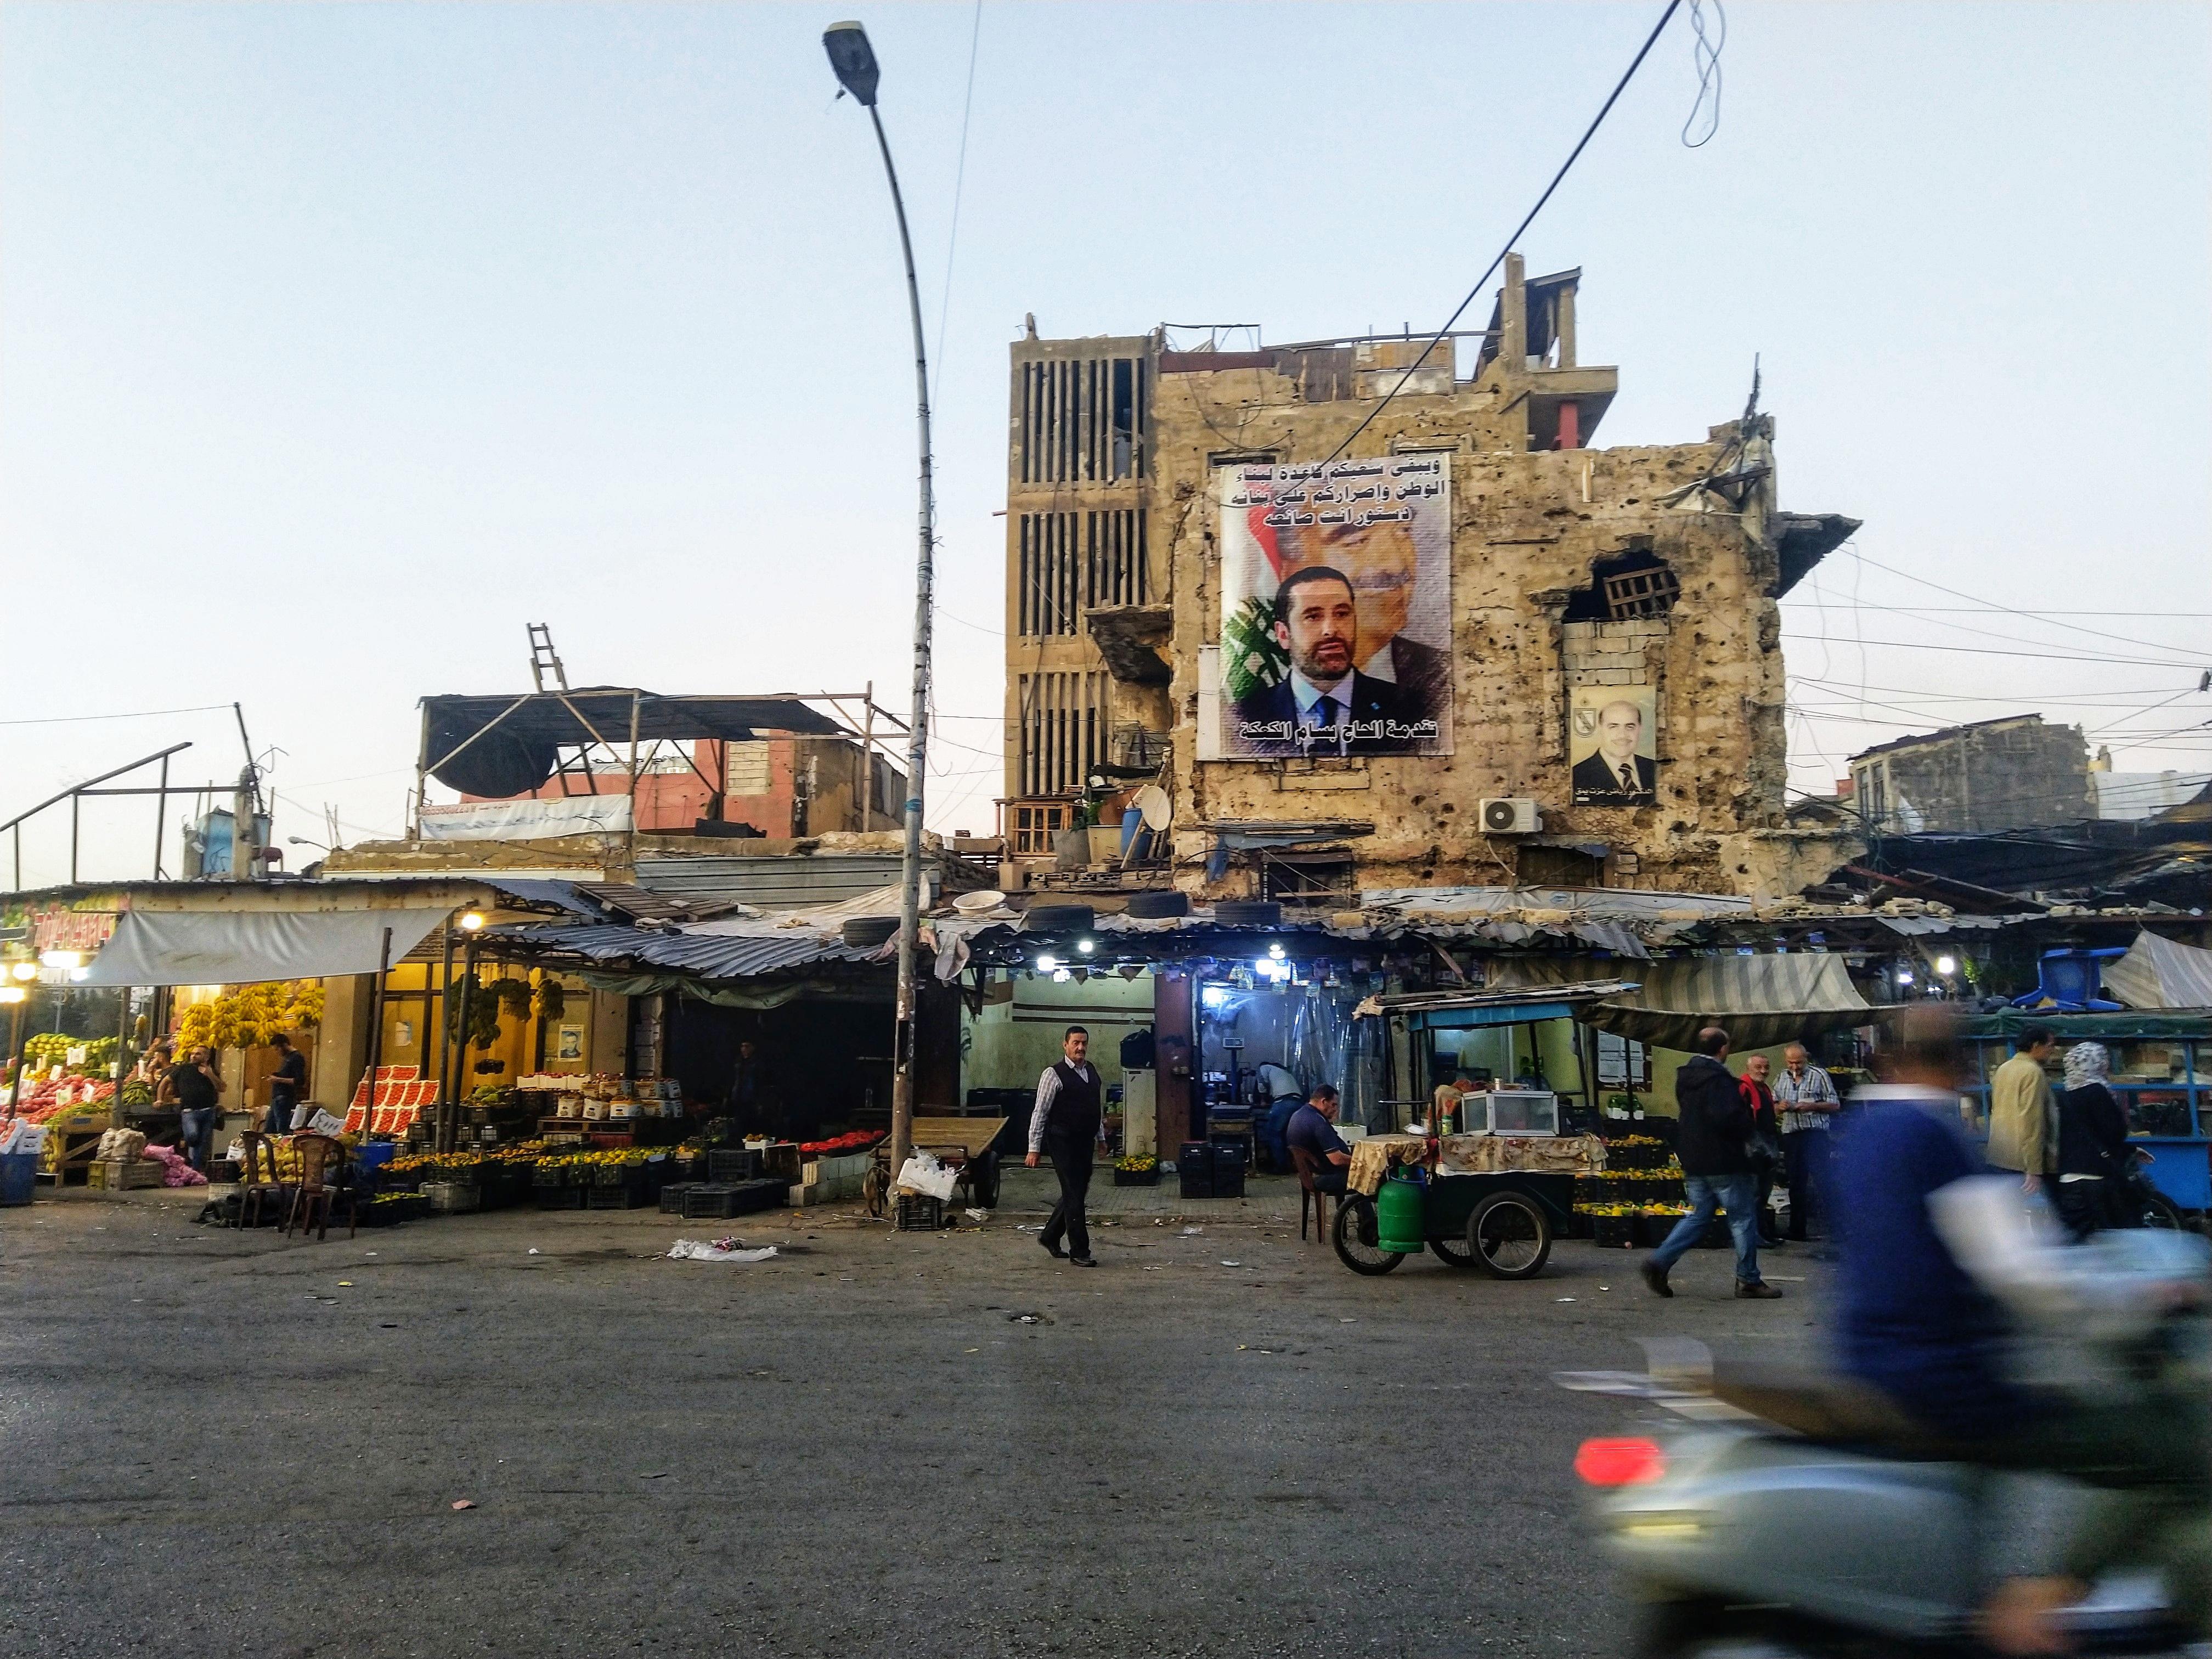 Saad al-haririn kuva Beirutissa